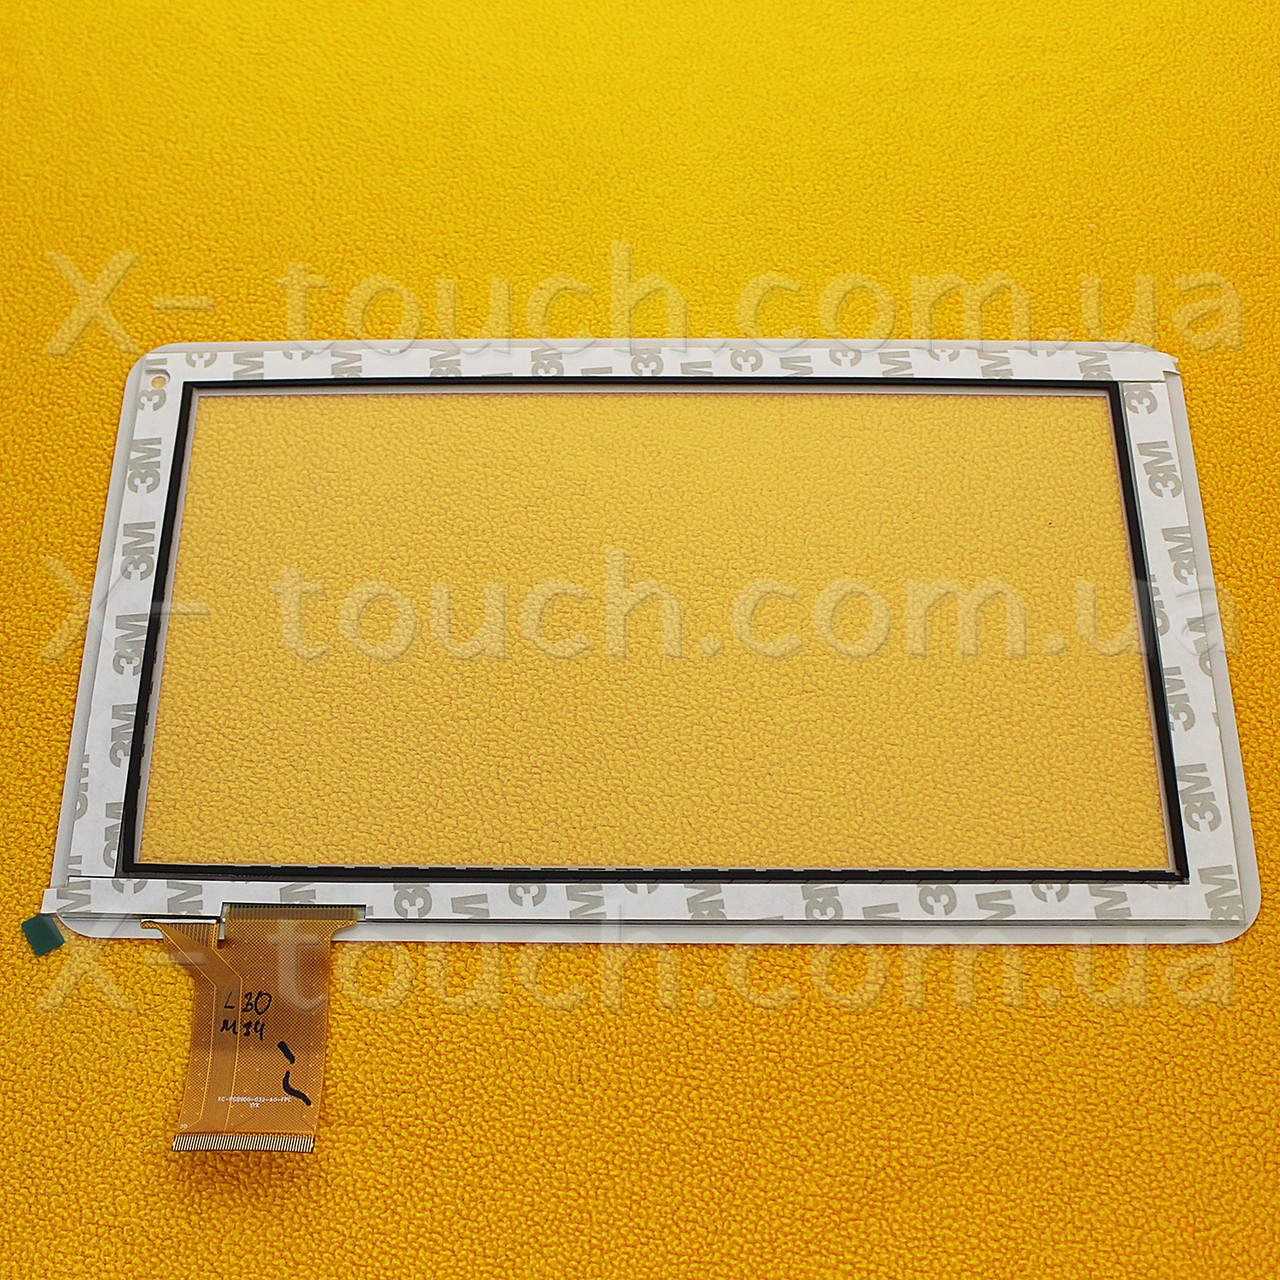 Тачскрин, сенсор  Ericsson S10 Fashion Edition  для планшета